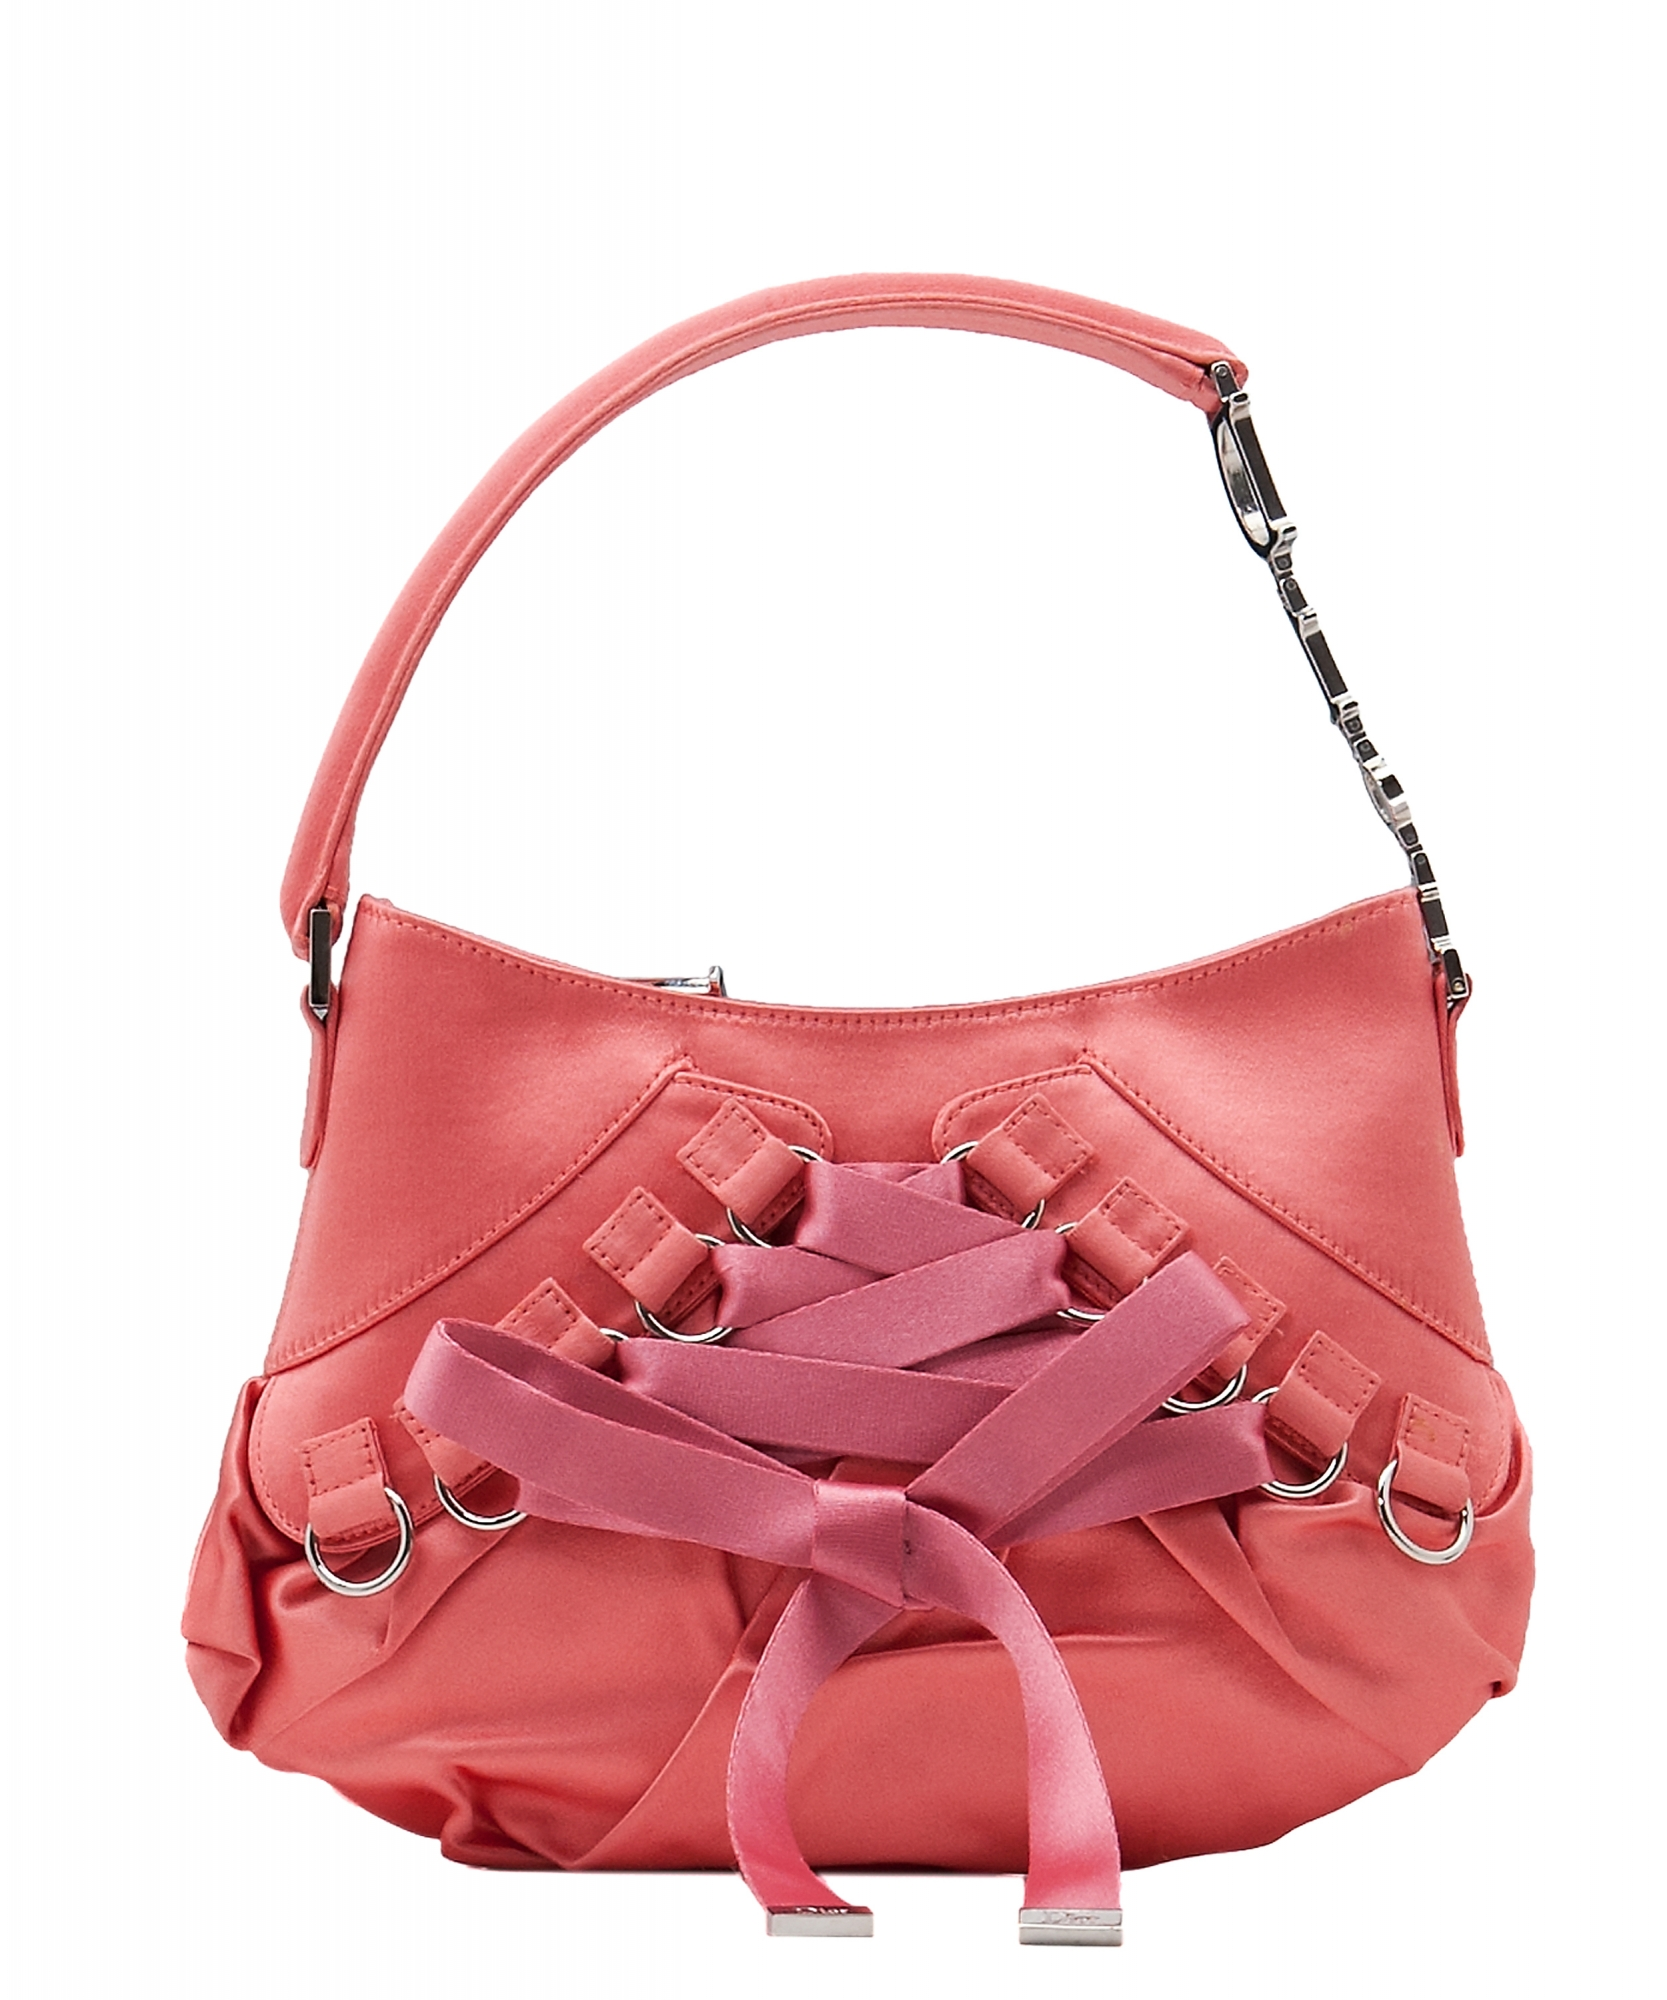 b111dfe5e6d11 Christian Dior Pink Satin Ballet Evening Bag | La Doyenne